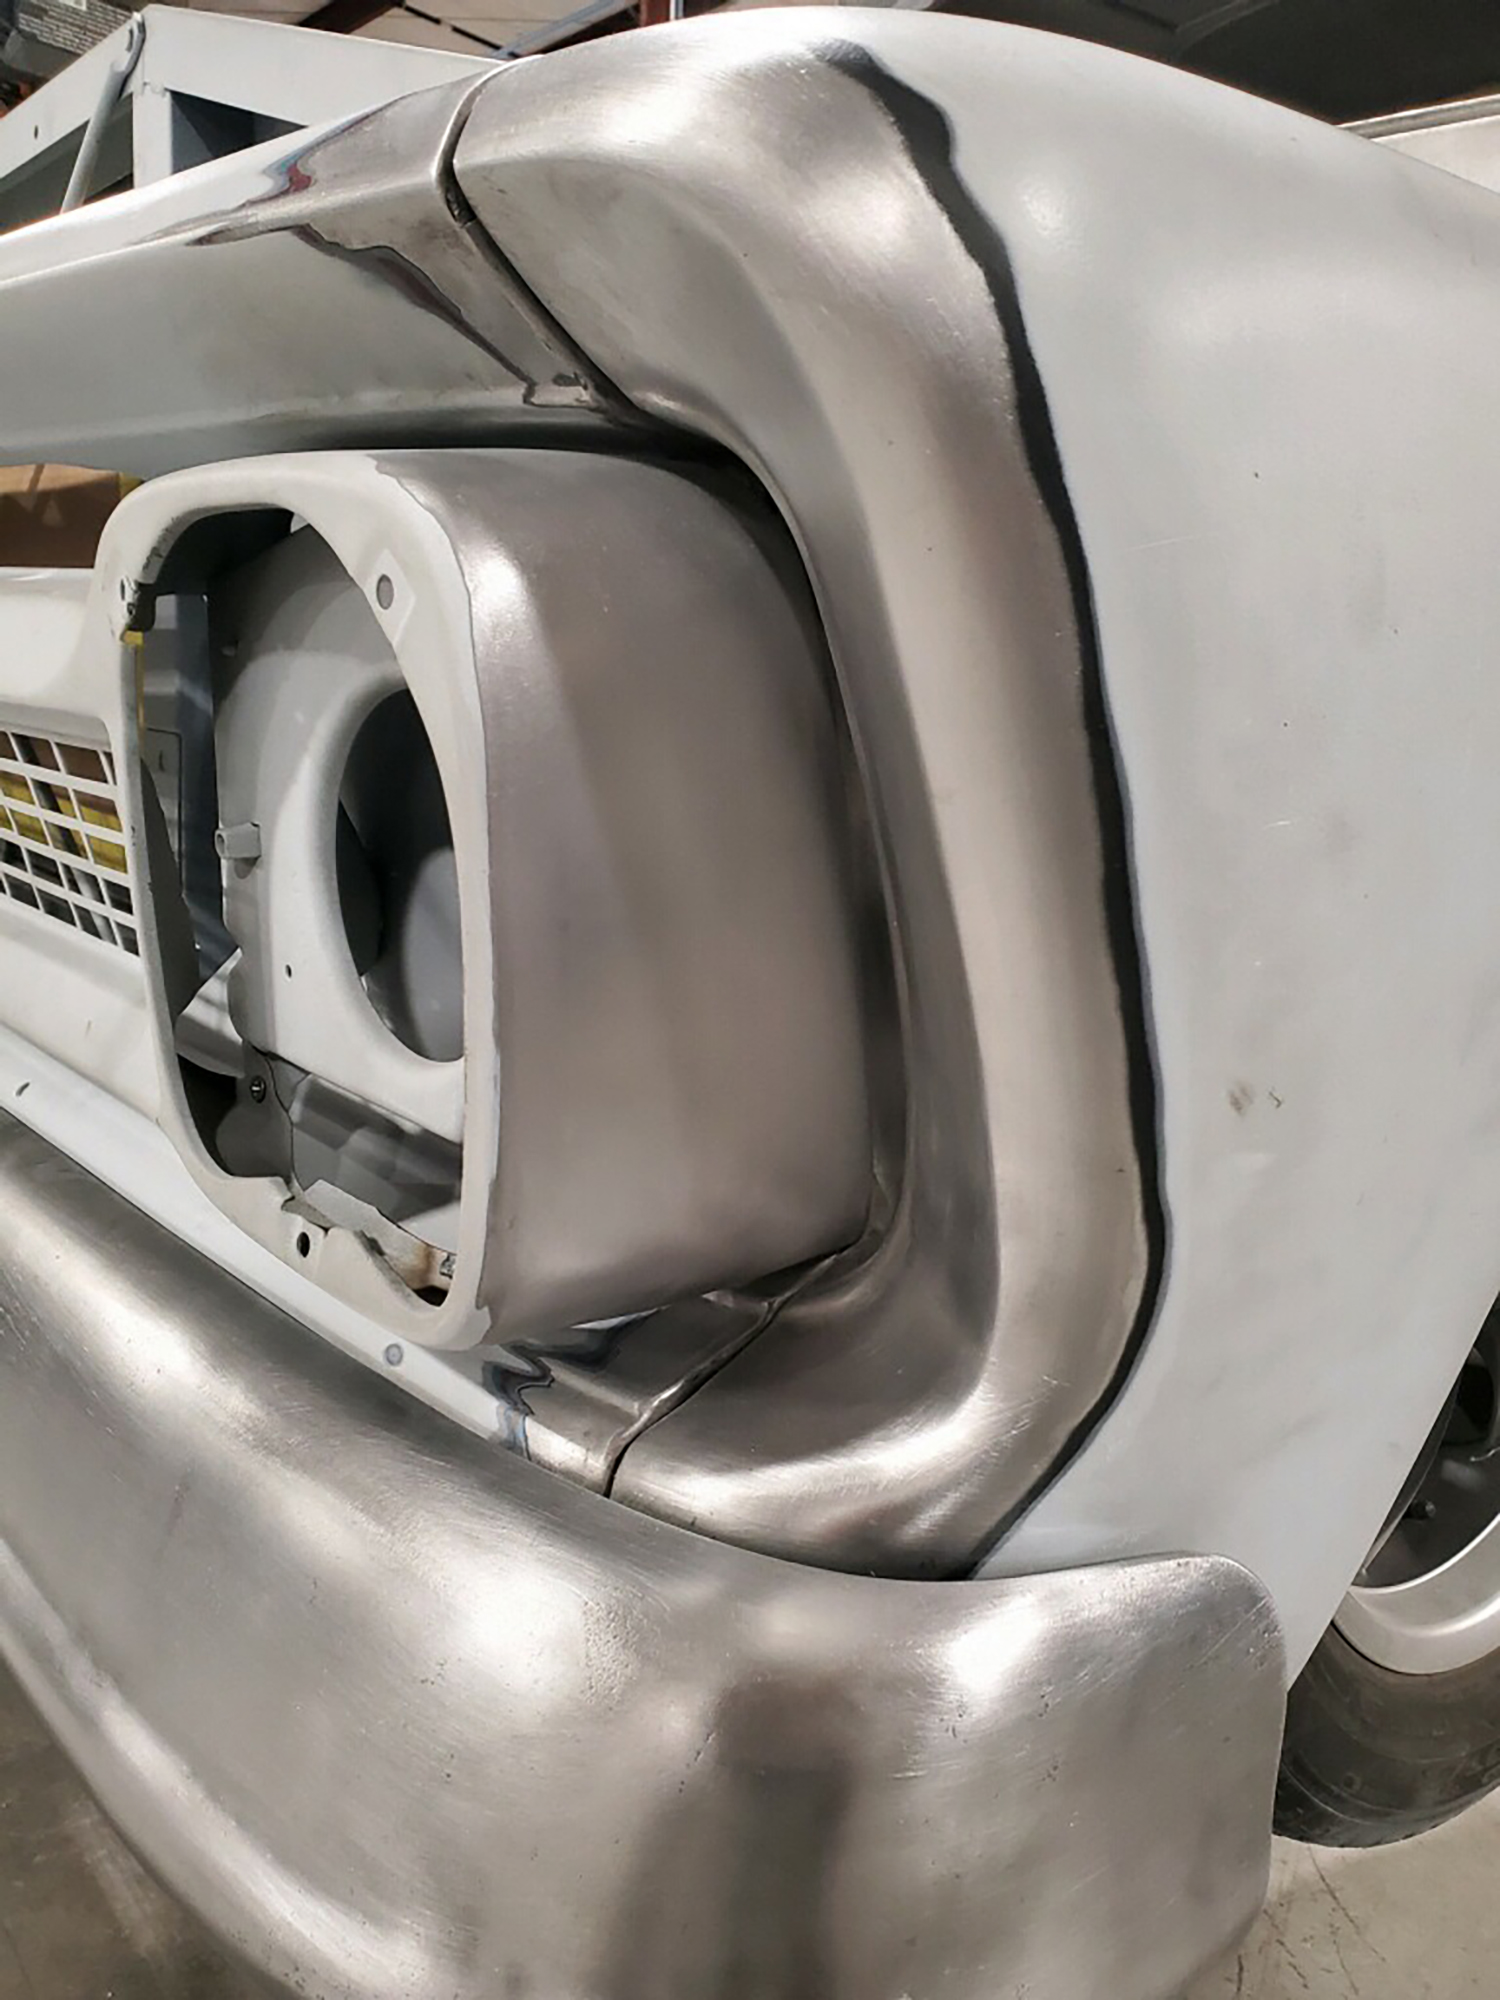 scotts-66-c10-panel-truck-12132019-7